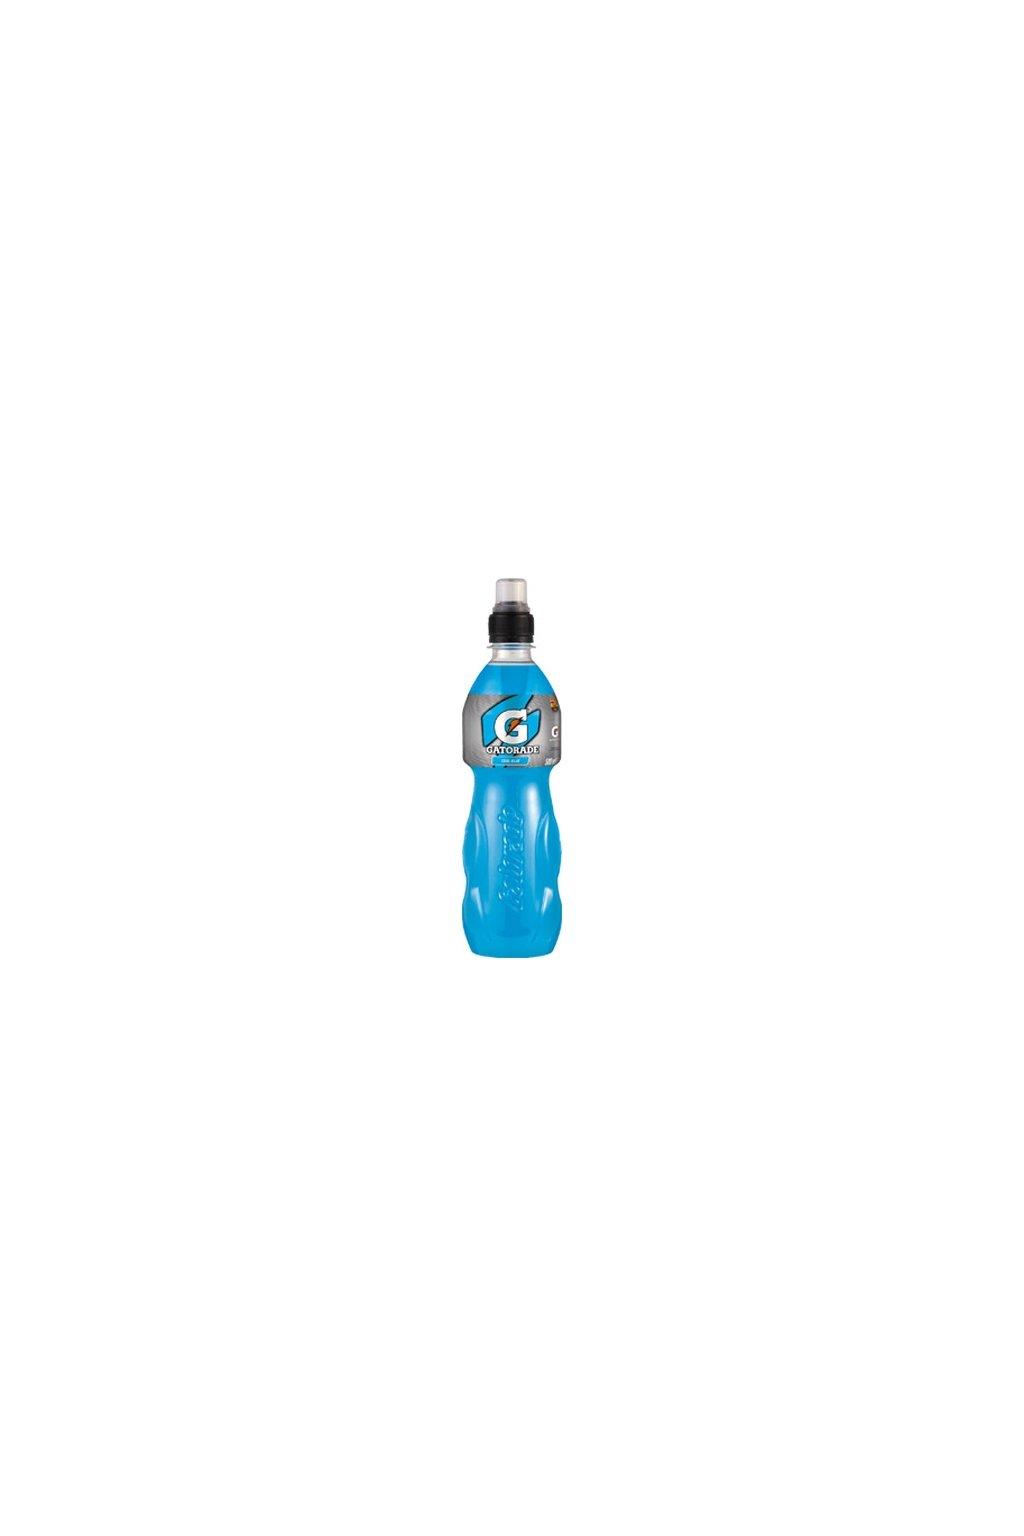 gatorade 260218856 0 5 pet coolblue 0